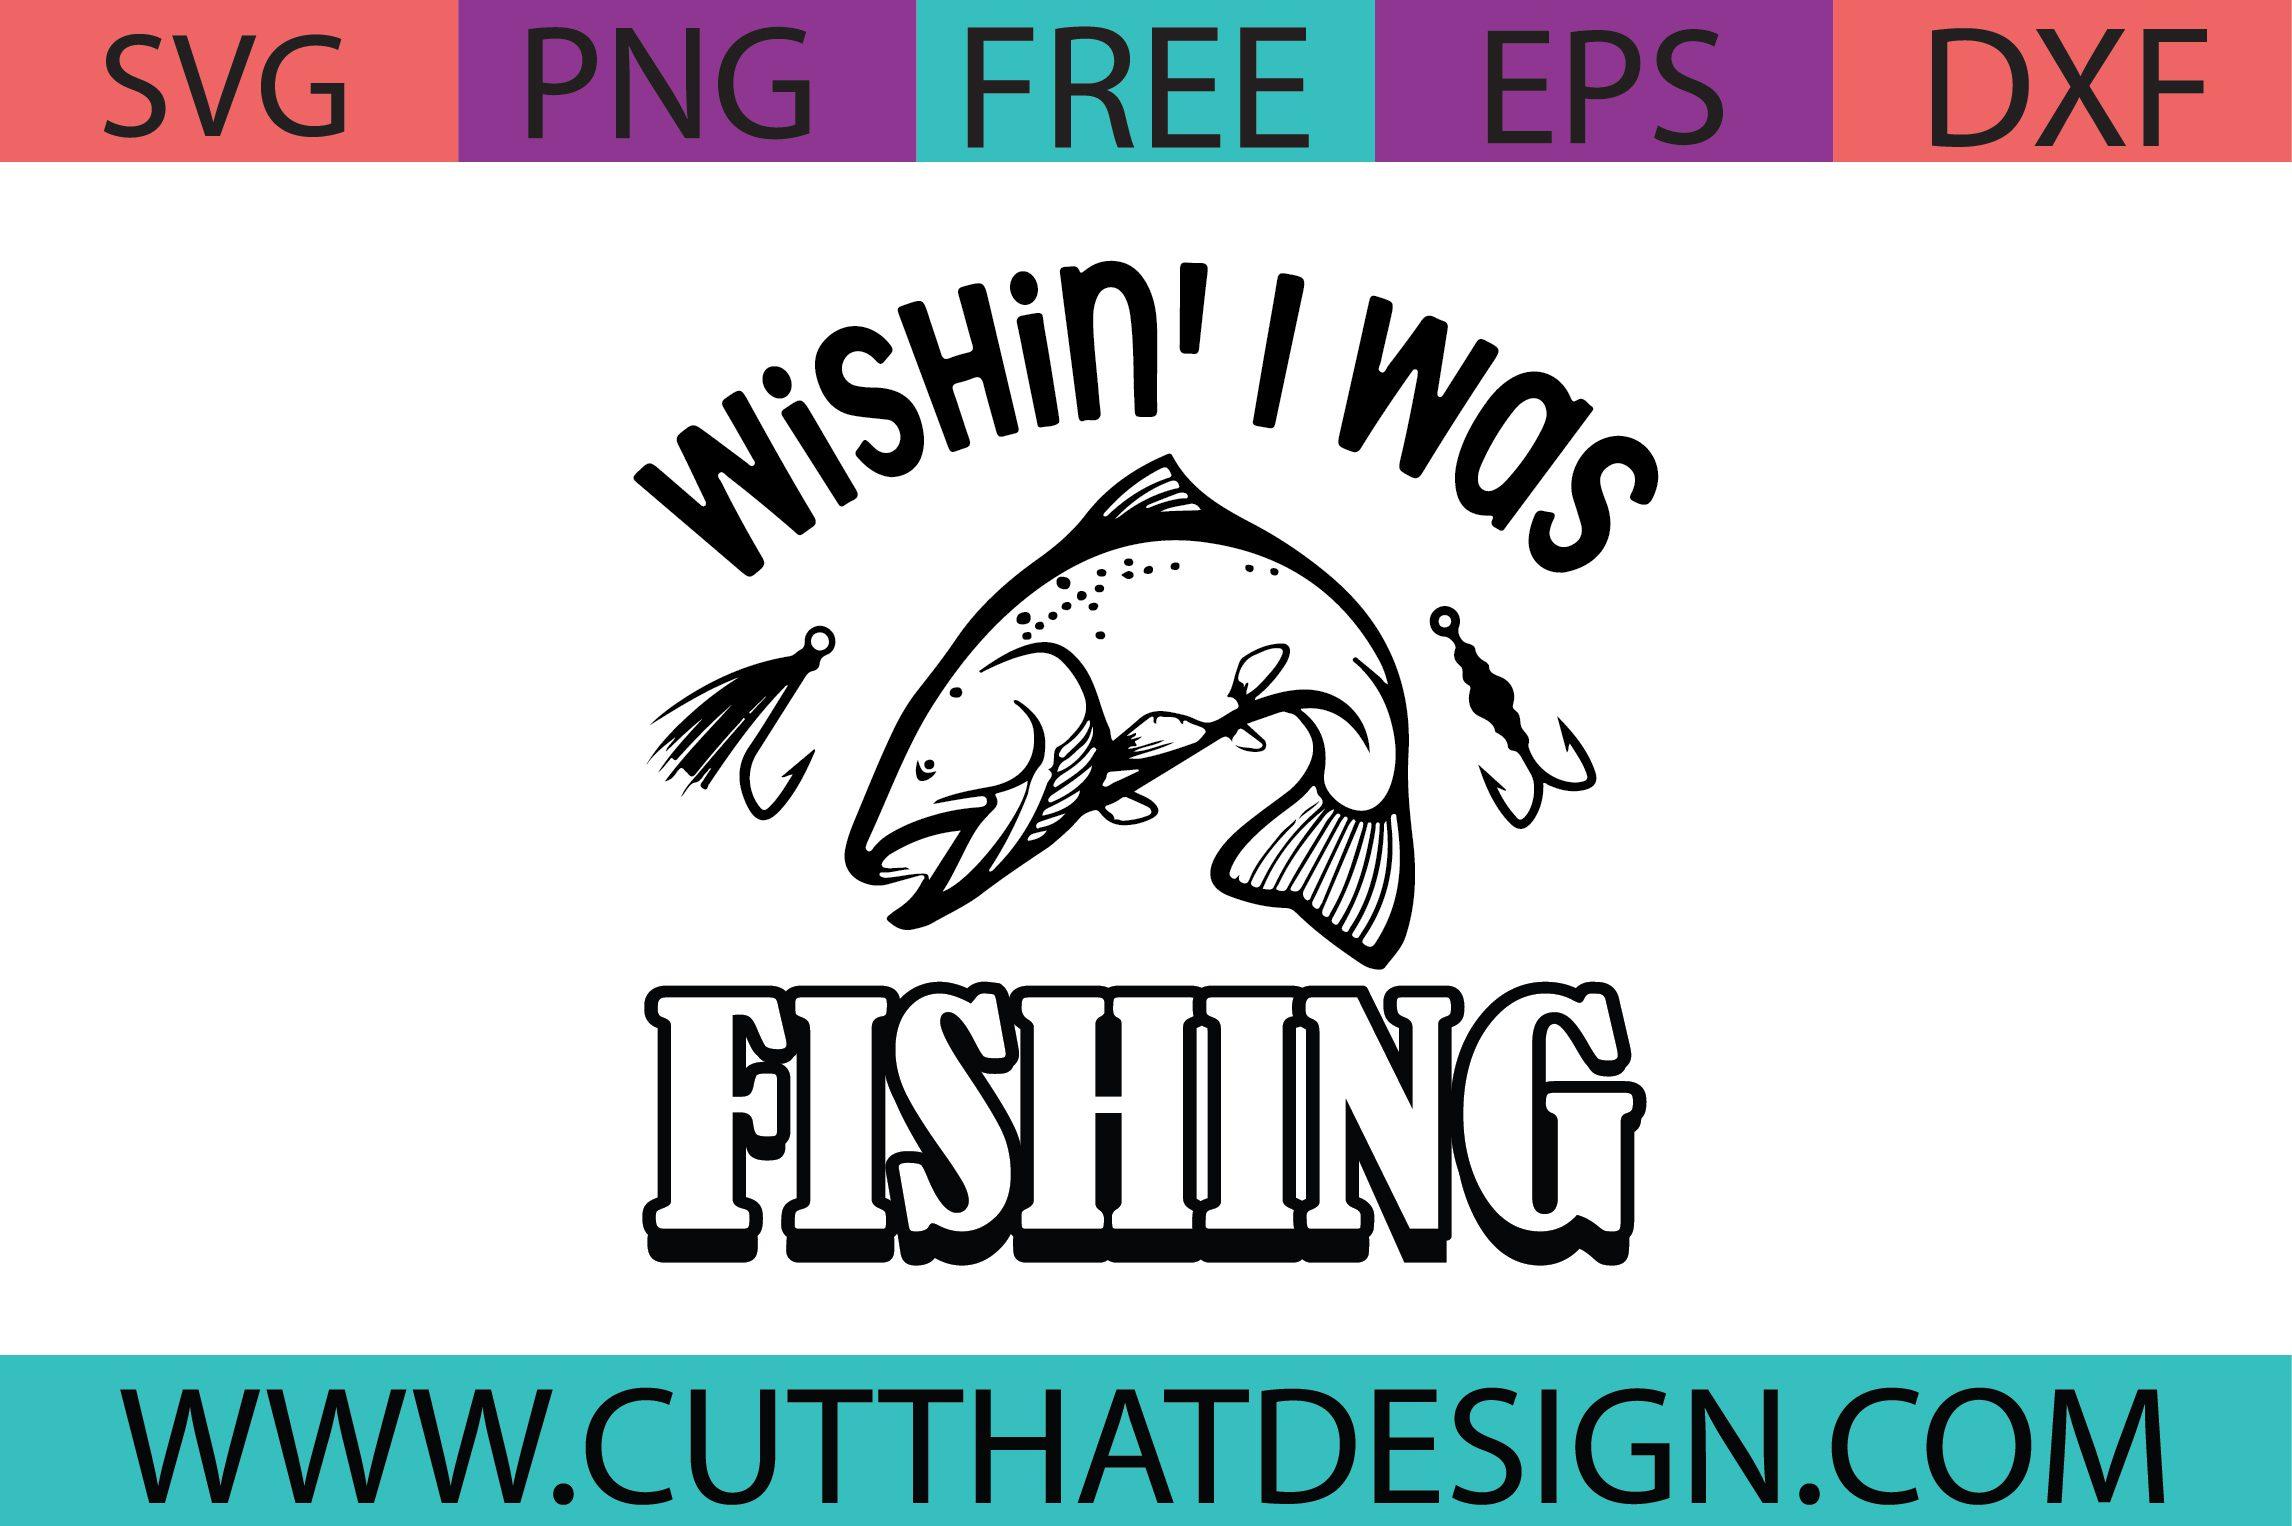 Download Free Svg Wishin I Was Fishing Cut That Design